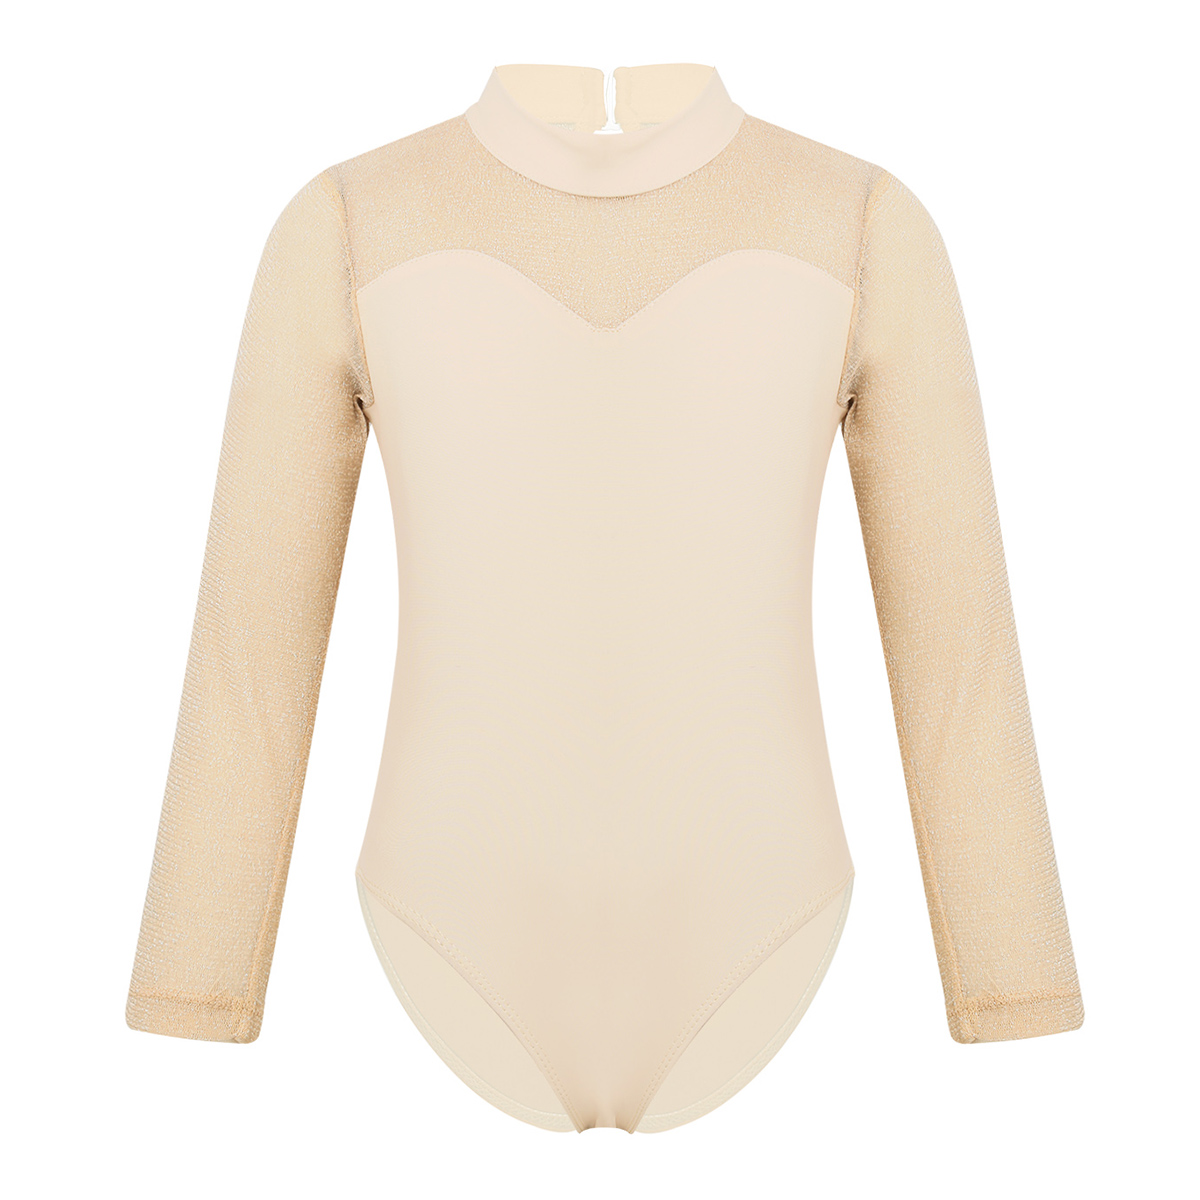 ESHOO Girls Gymnastic Bodysuit Lace Fly Sleeve Leotards Dancewear Ballet Costume